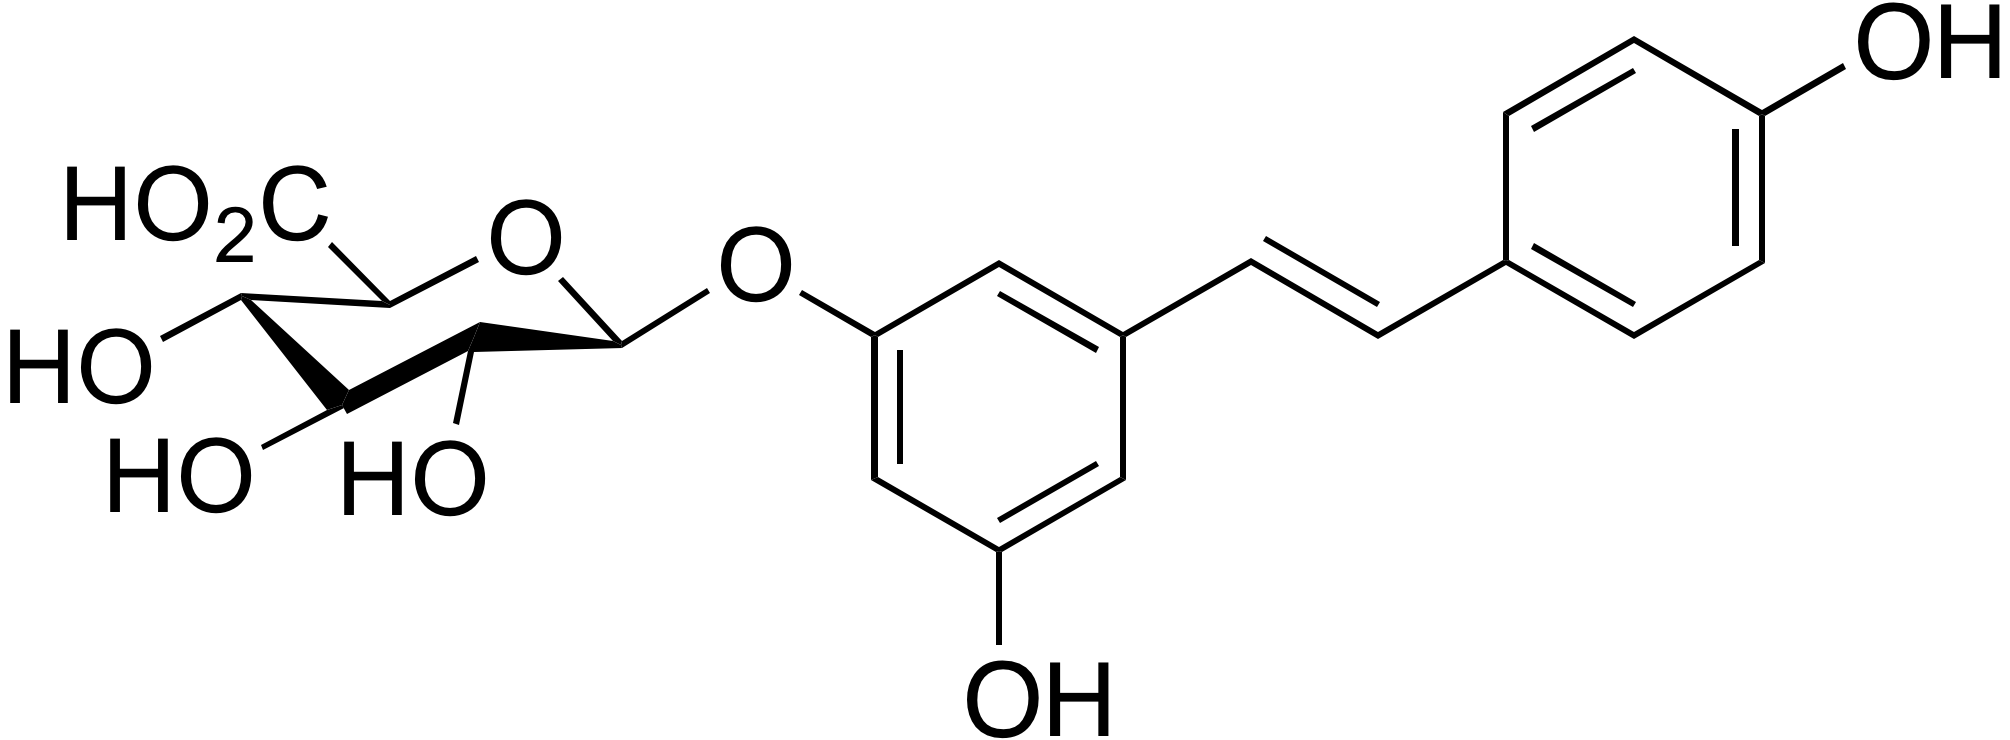 trans-Resveratrol 3-β-D-glucuronide